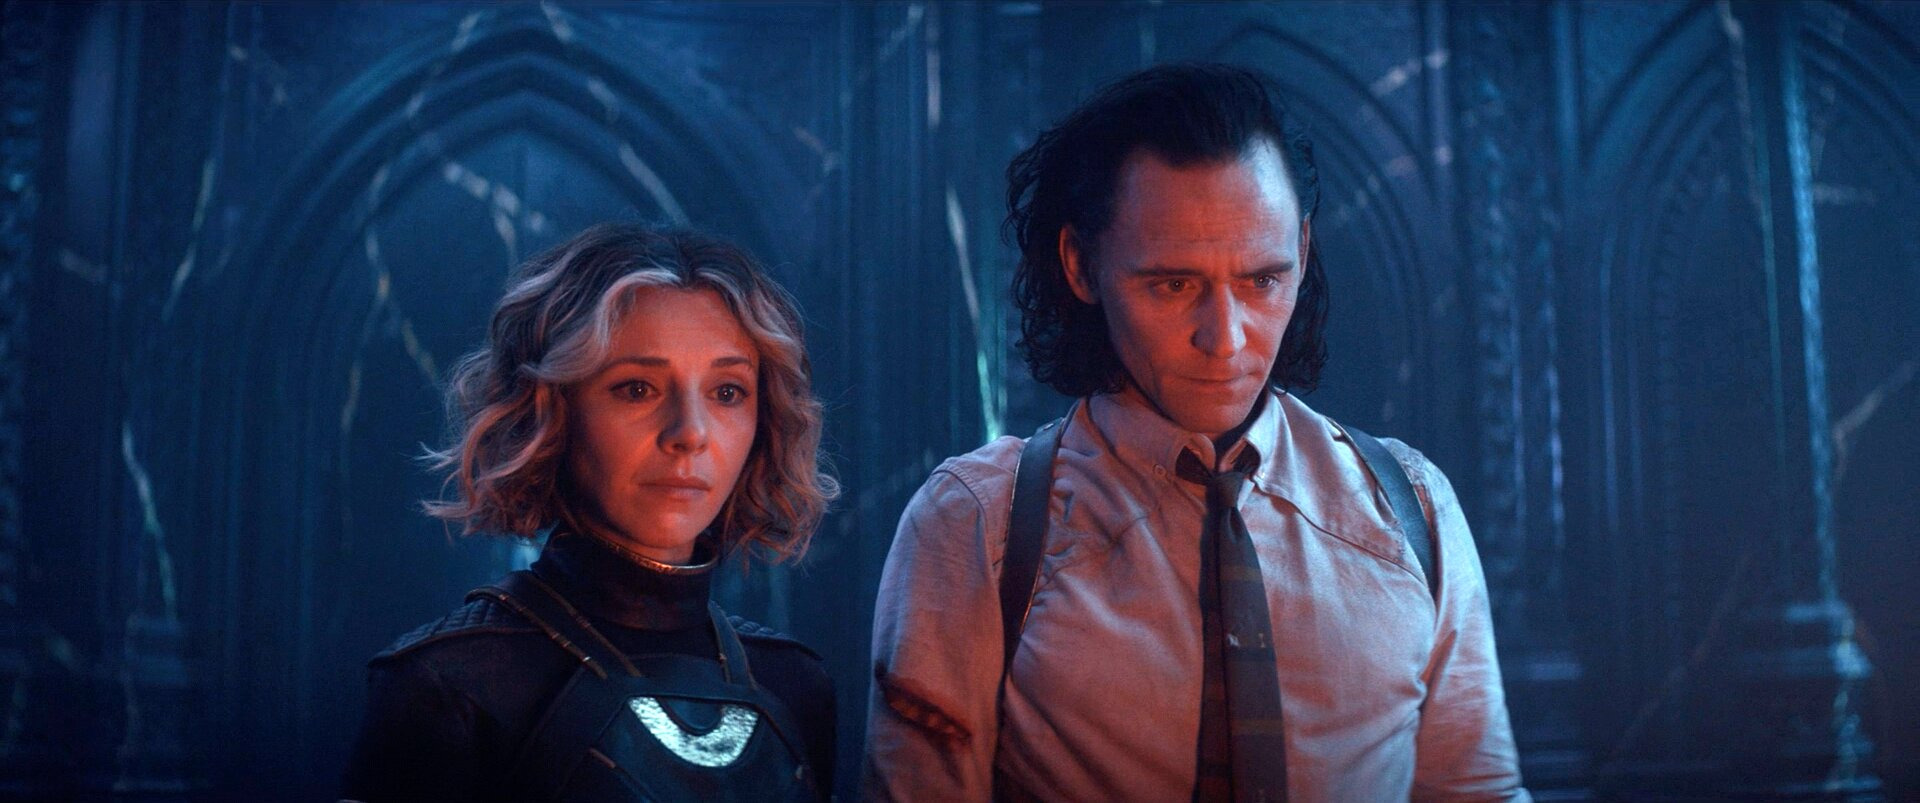 Loki — s01e06 — For All Time. Always.